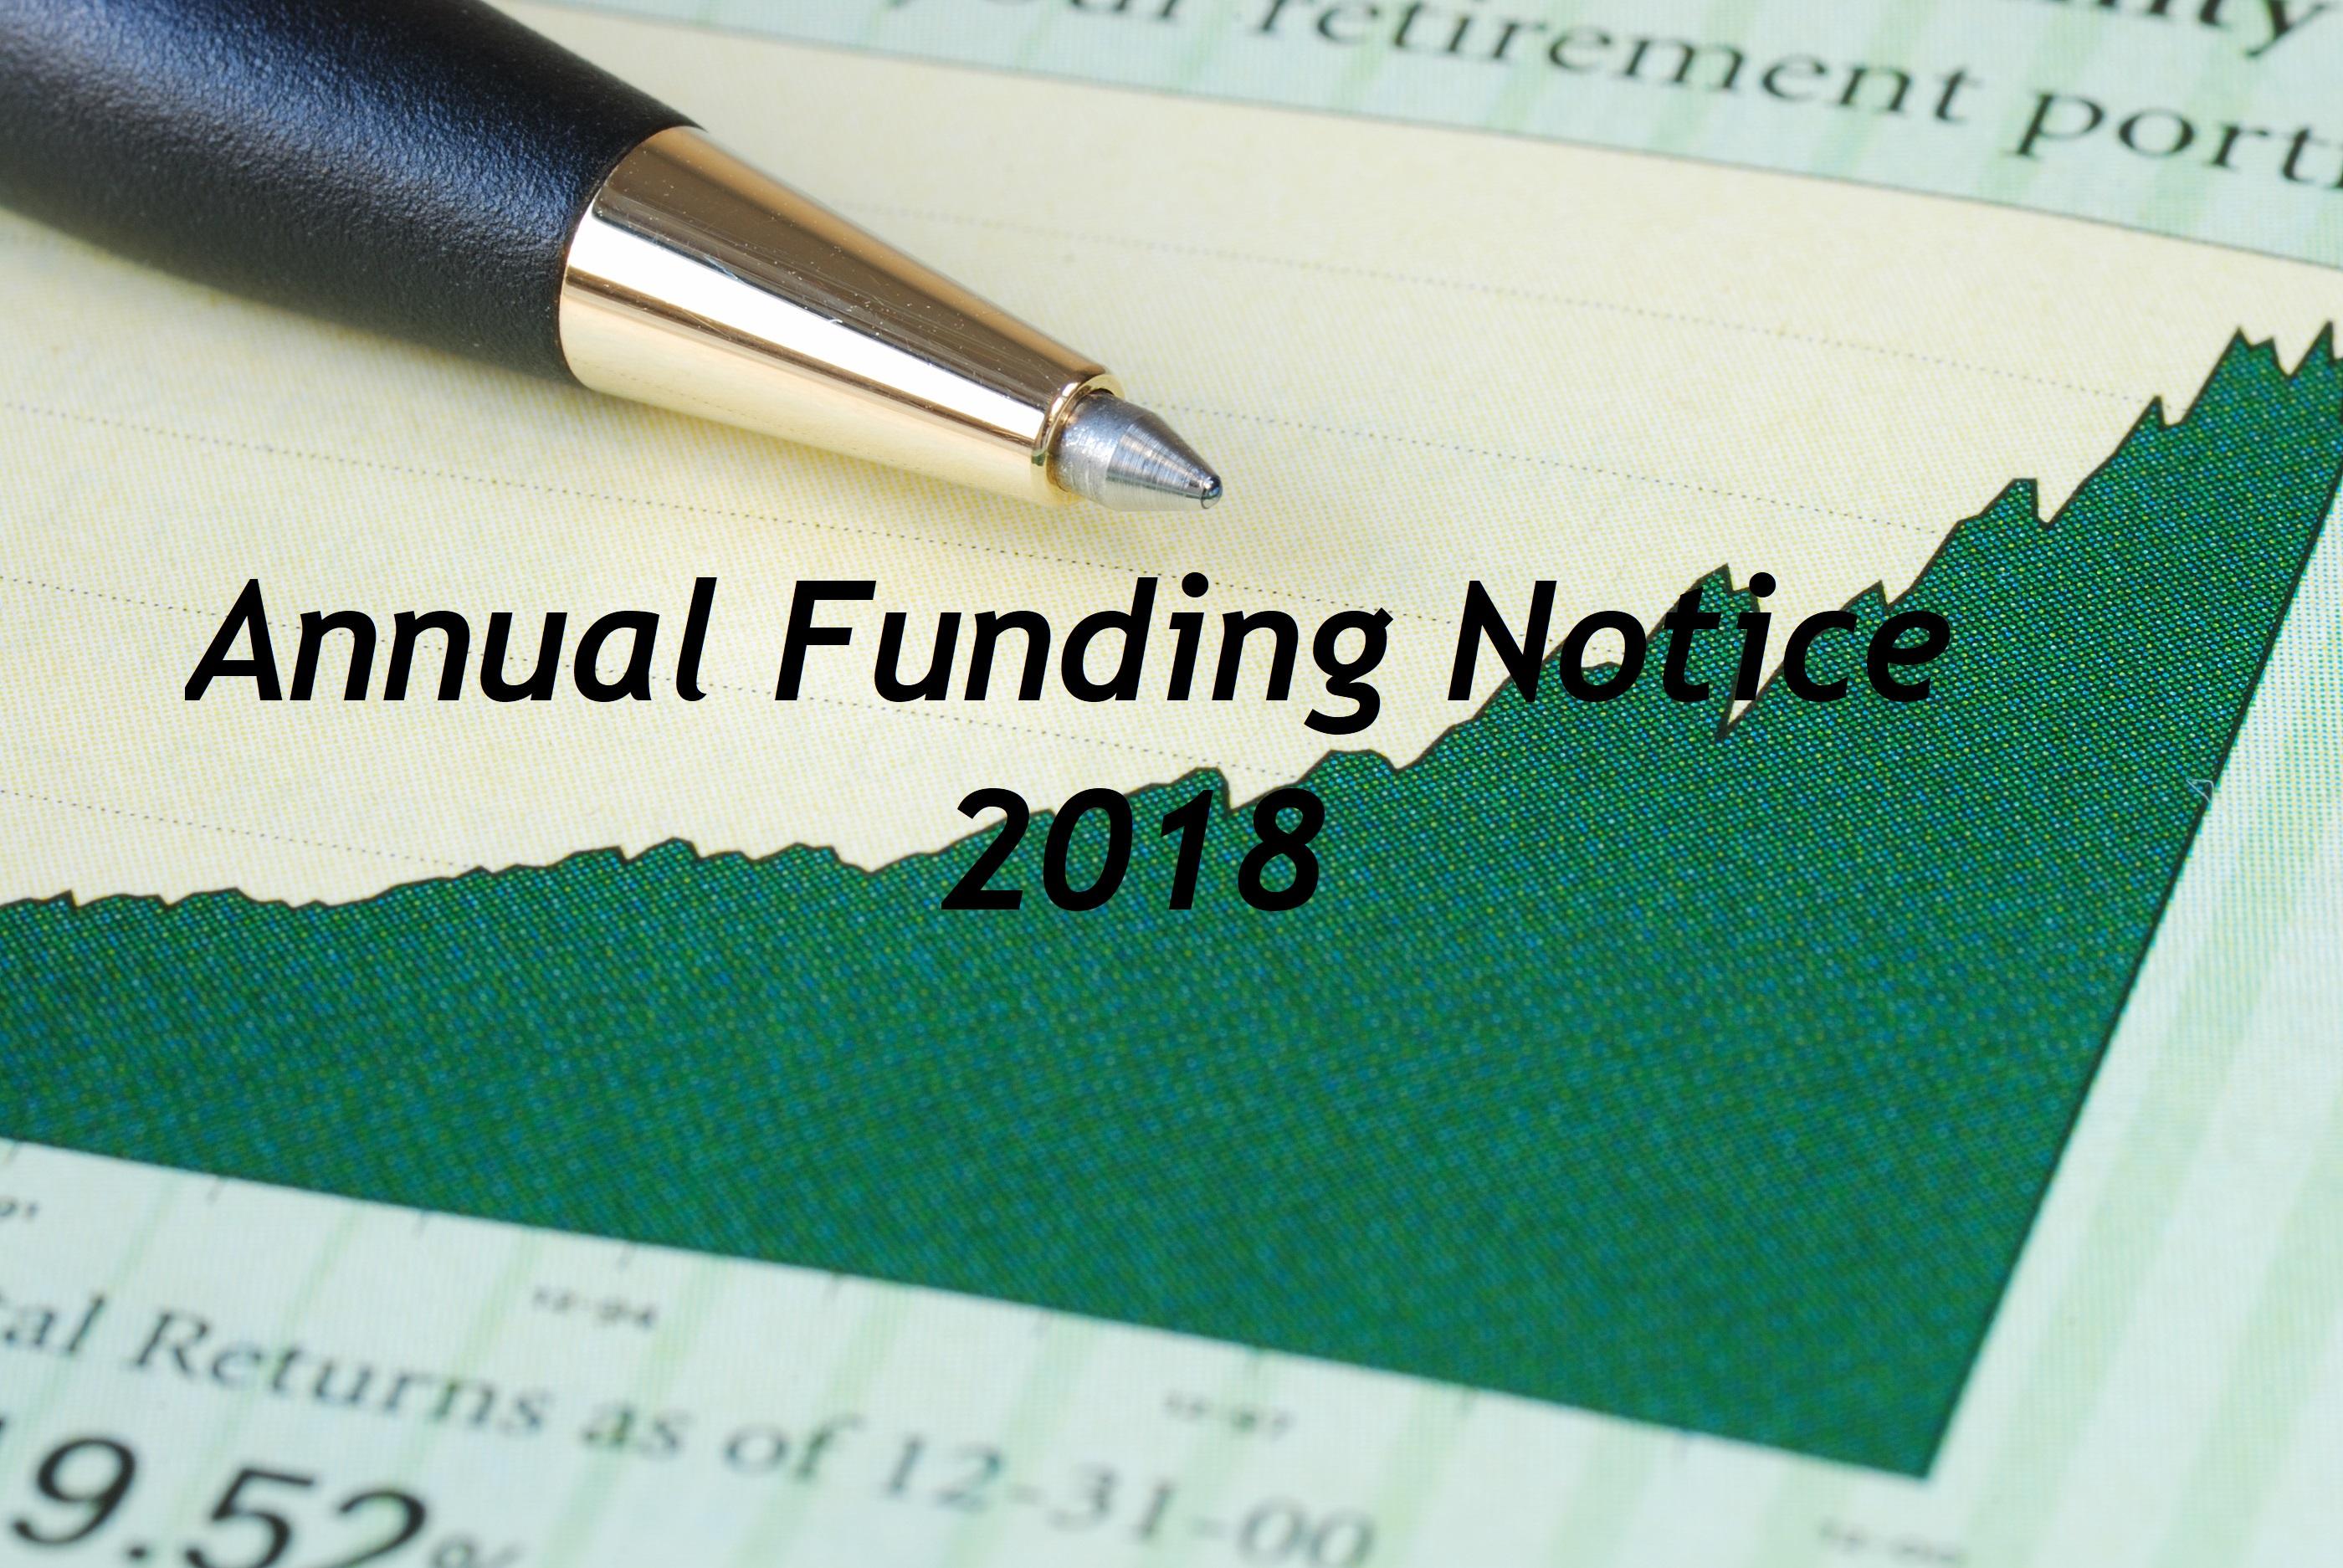 2017 Annual Funding Notice – April 23, 2018